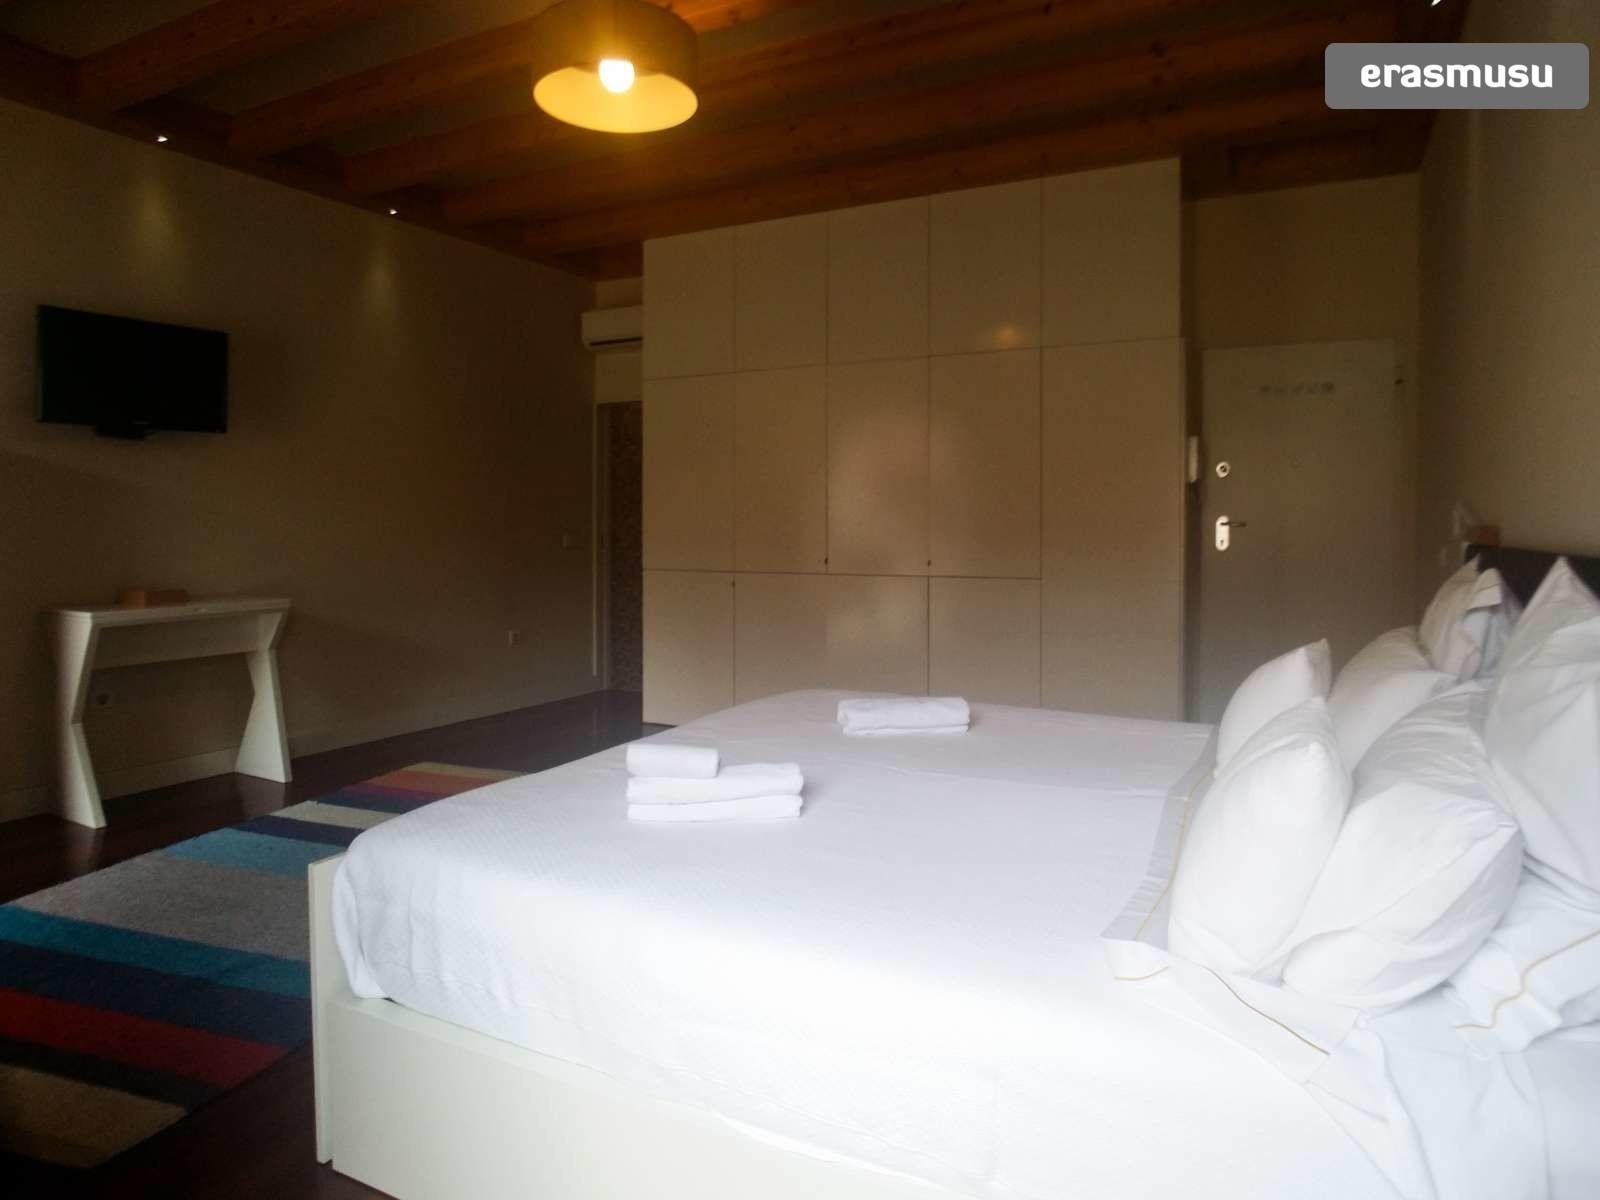 furnished-studio-apartment-rent-sao-nicolau-ecd36ce8591584e3d465